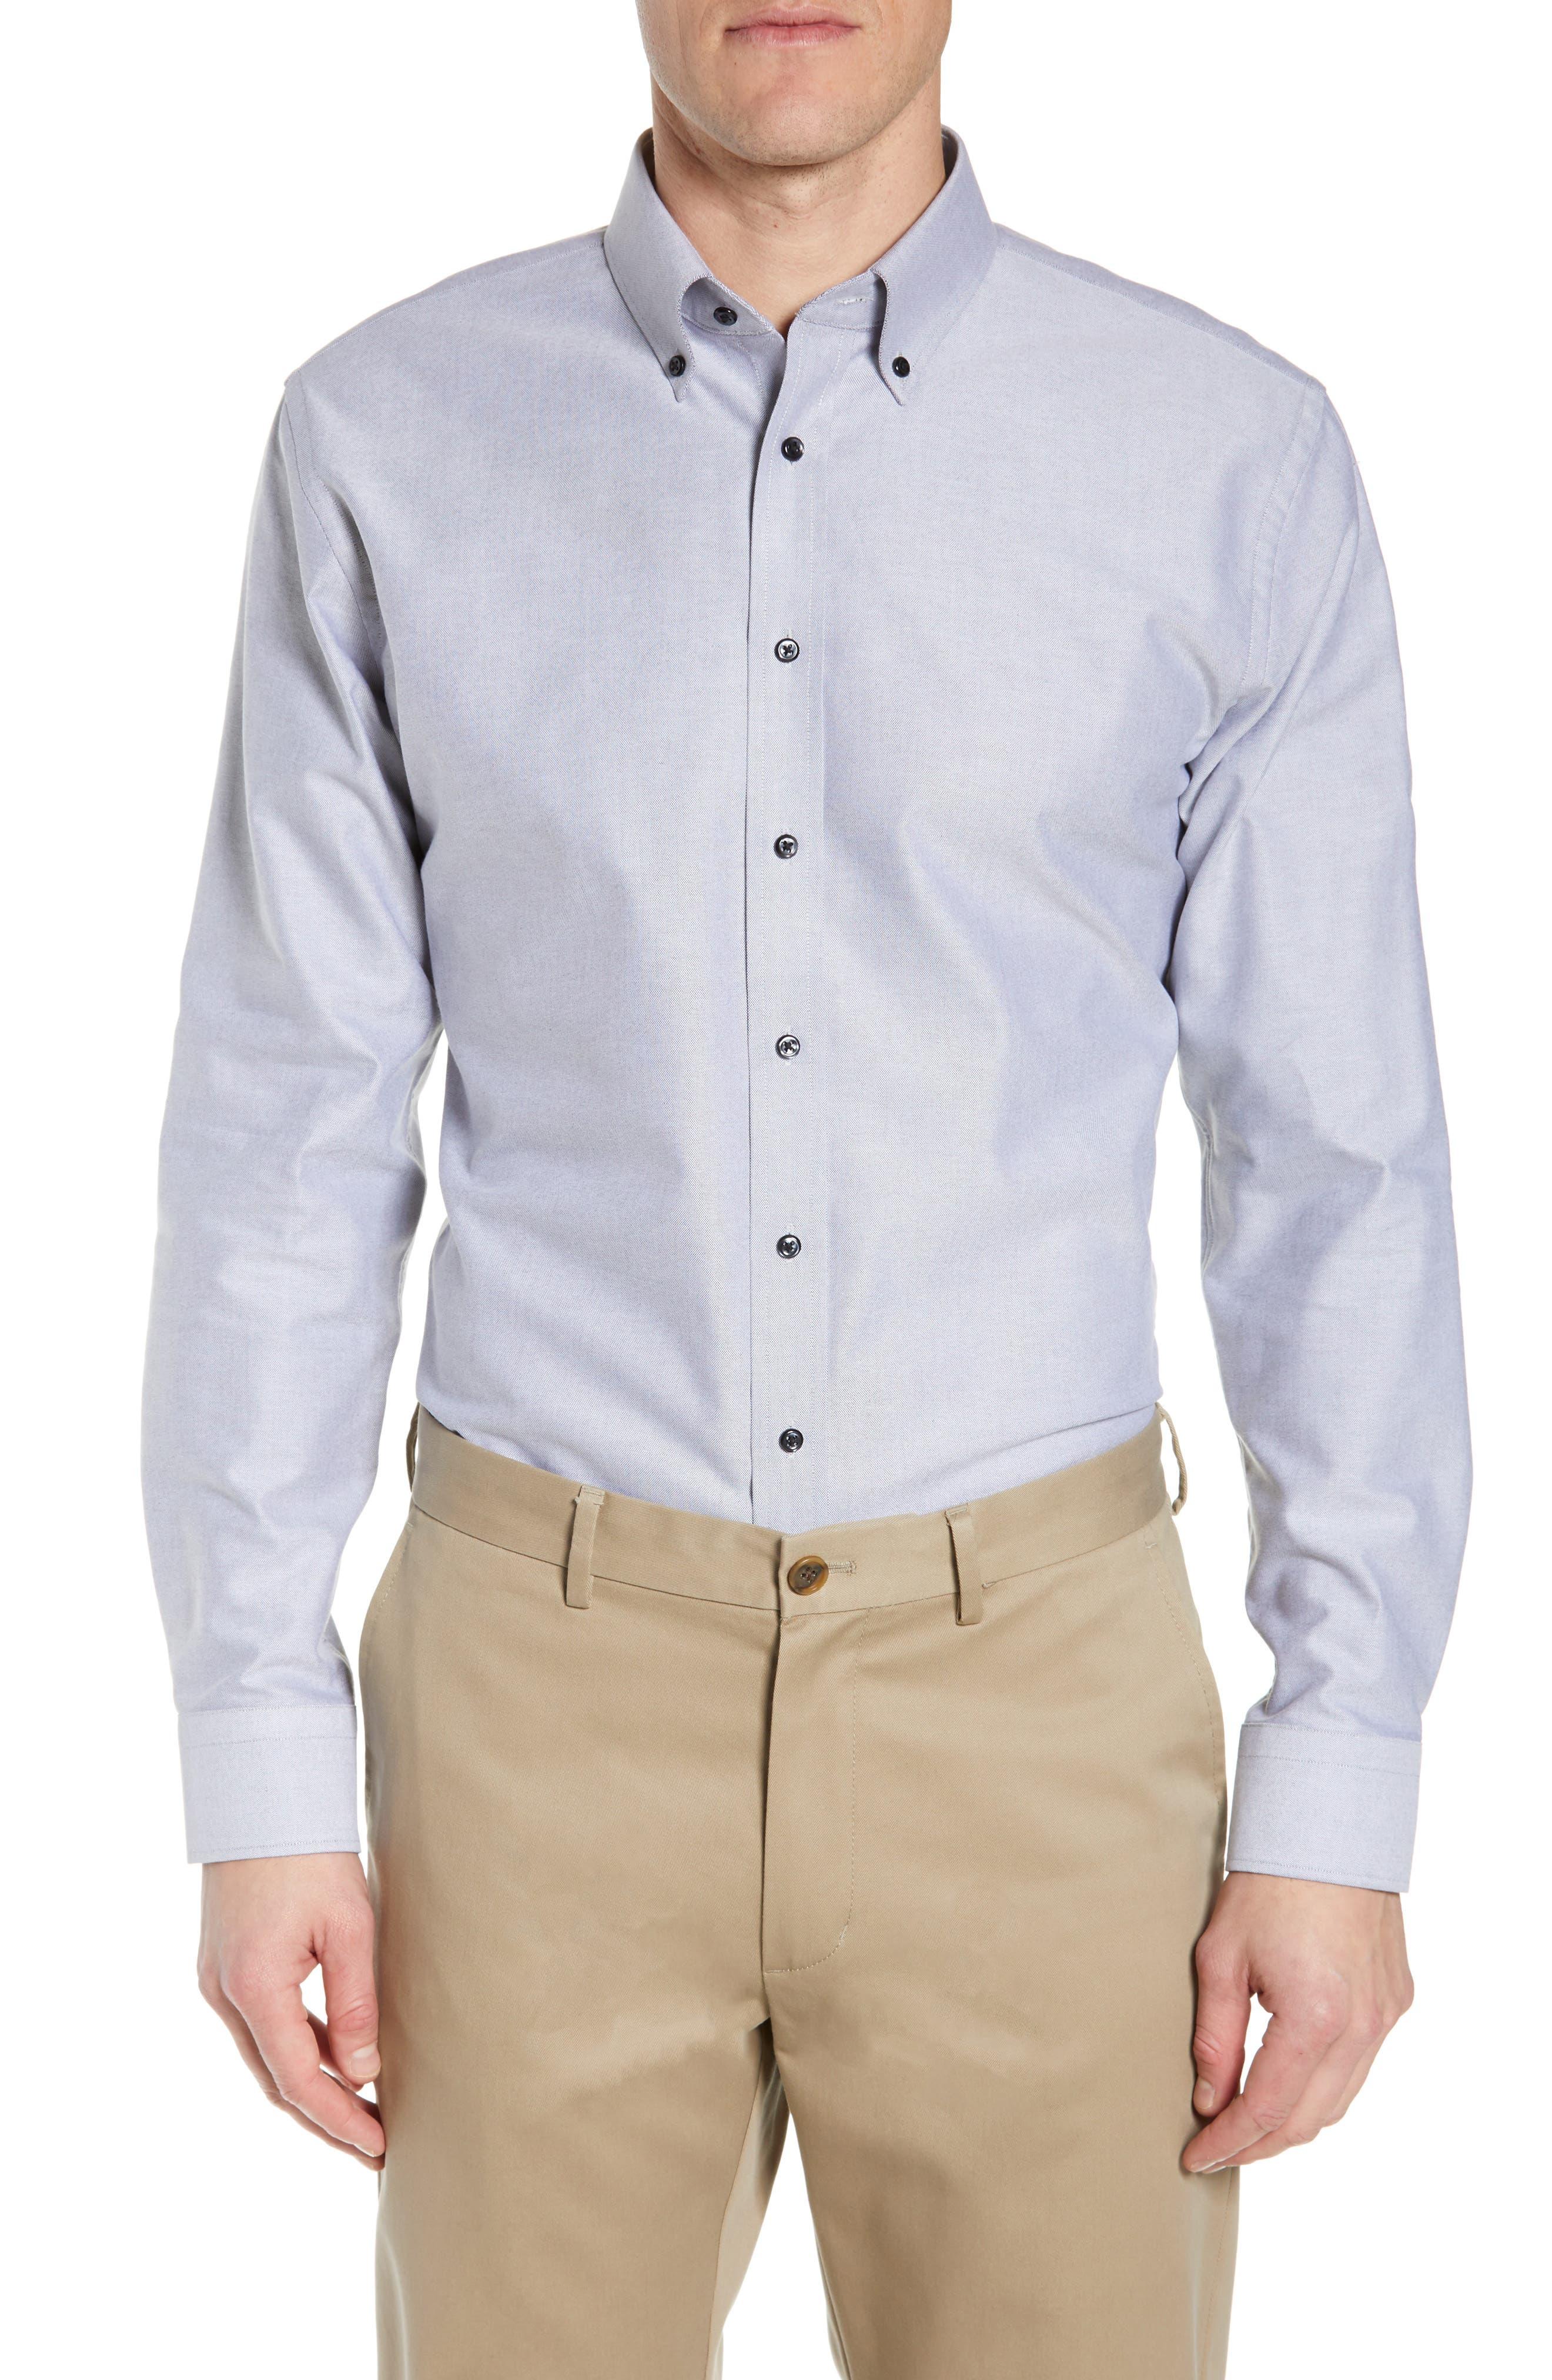 Trim Fit Oxford Dress Shirt, Main, color, GREY FEATHER